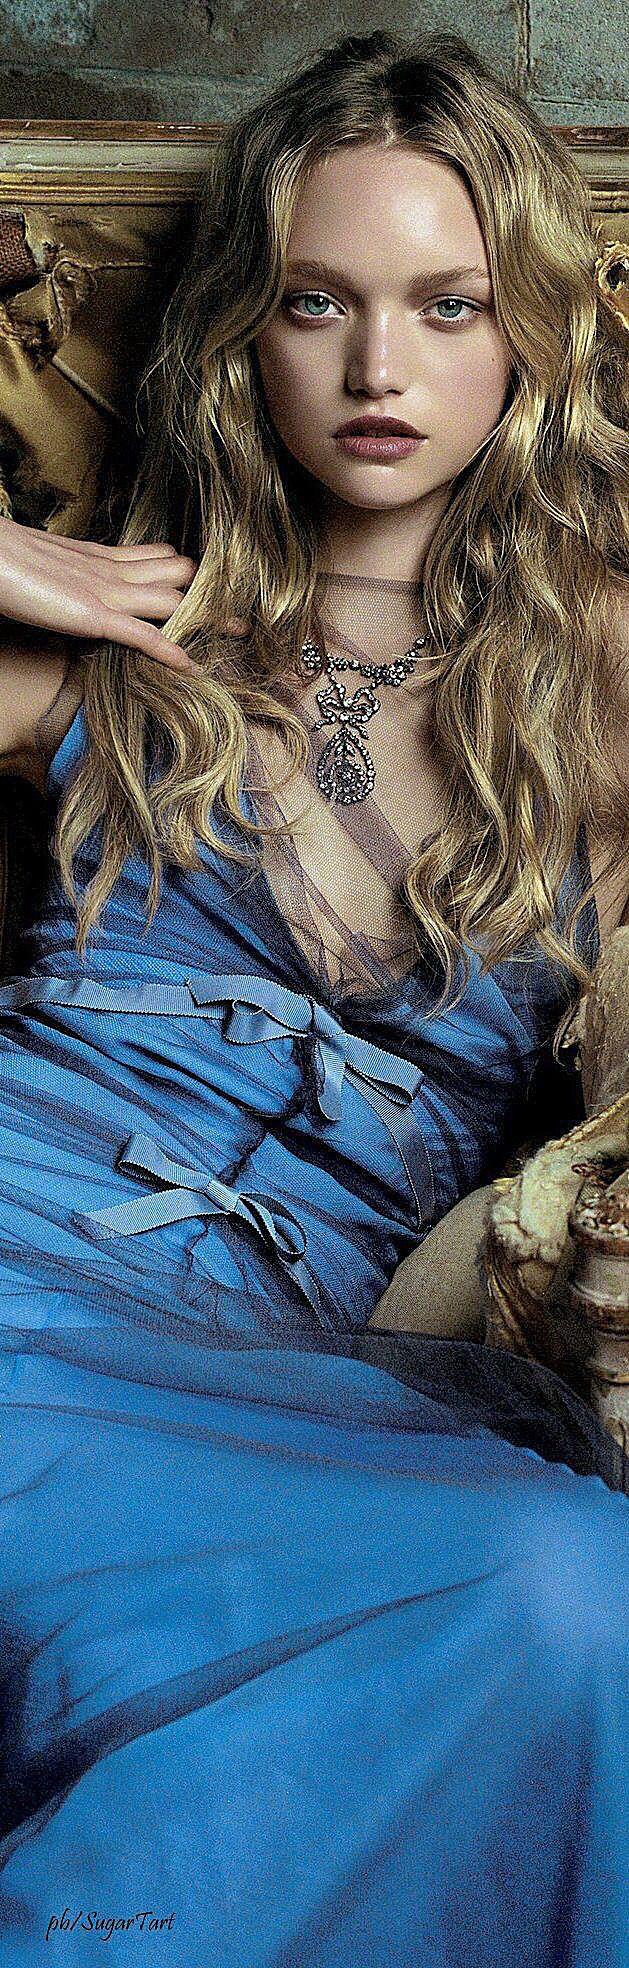 Gemma Ward.     molly lucille